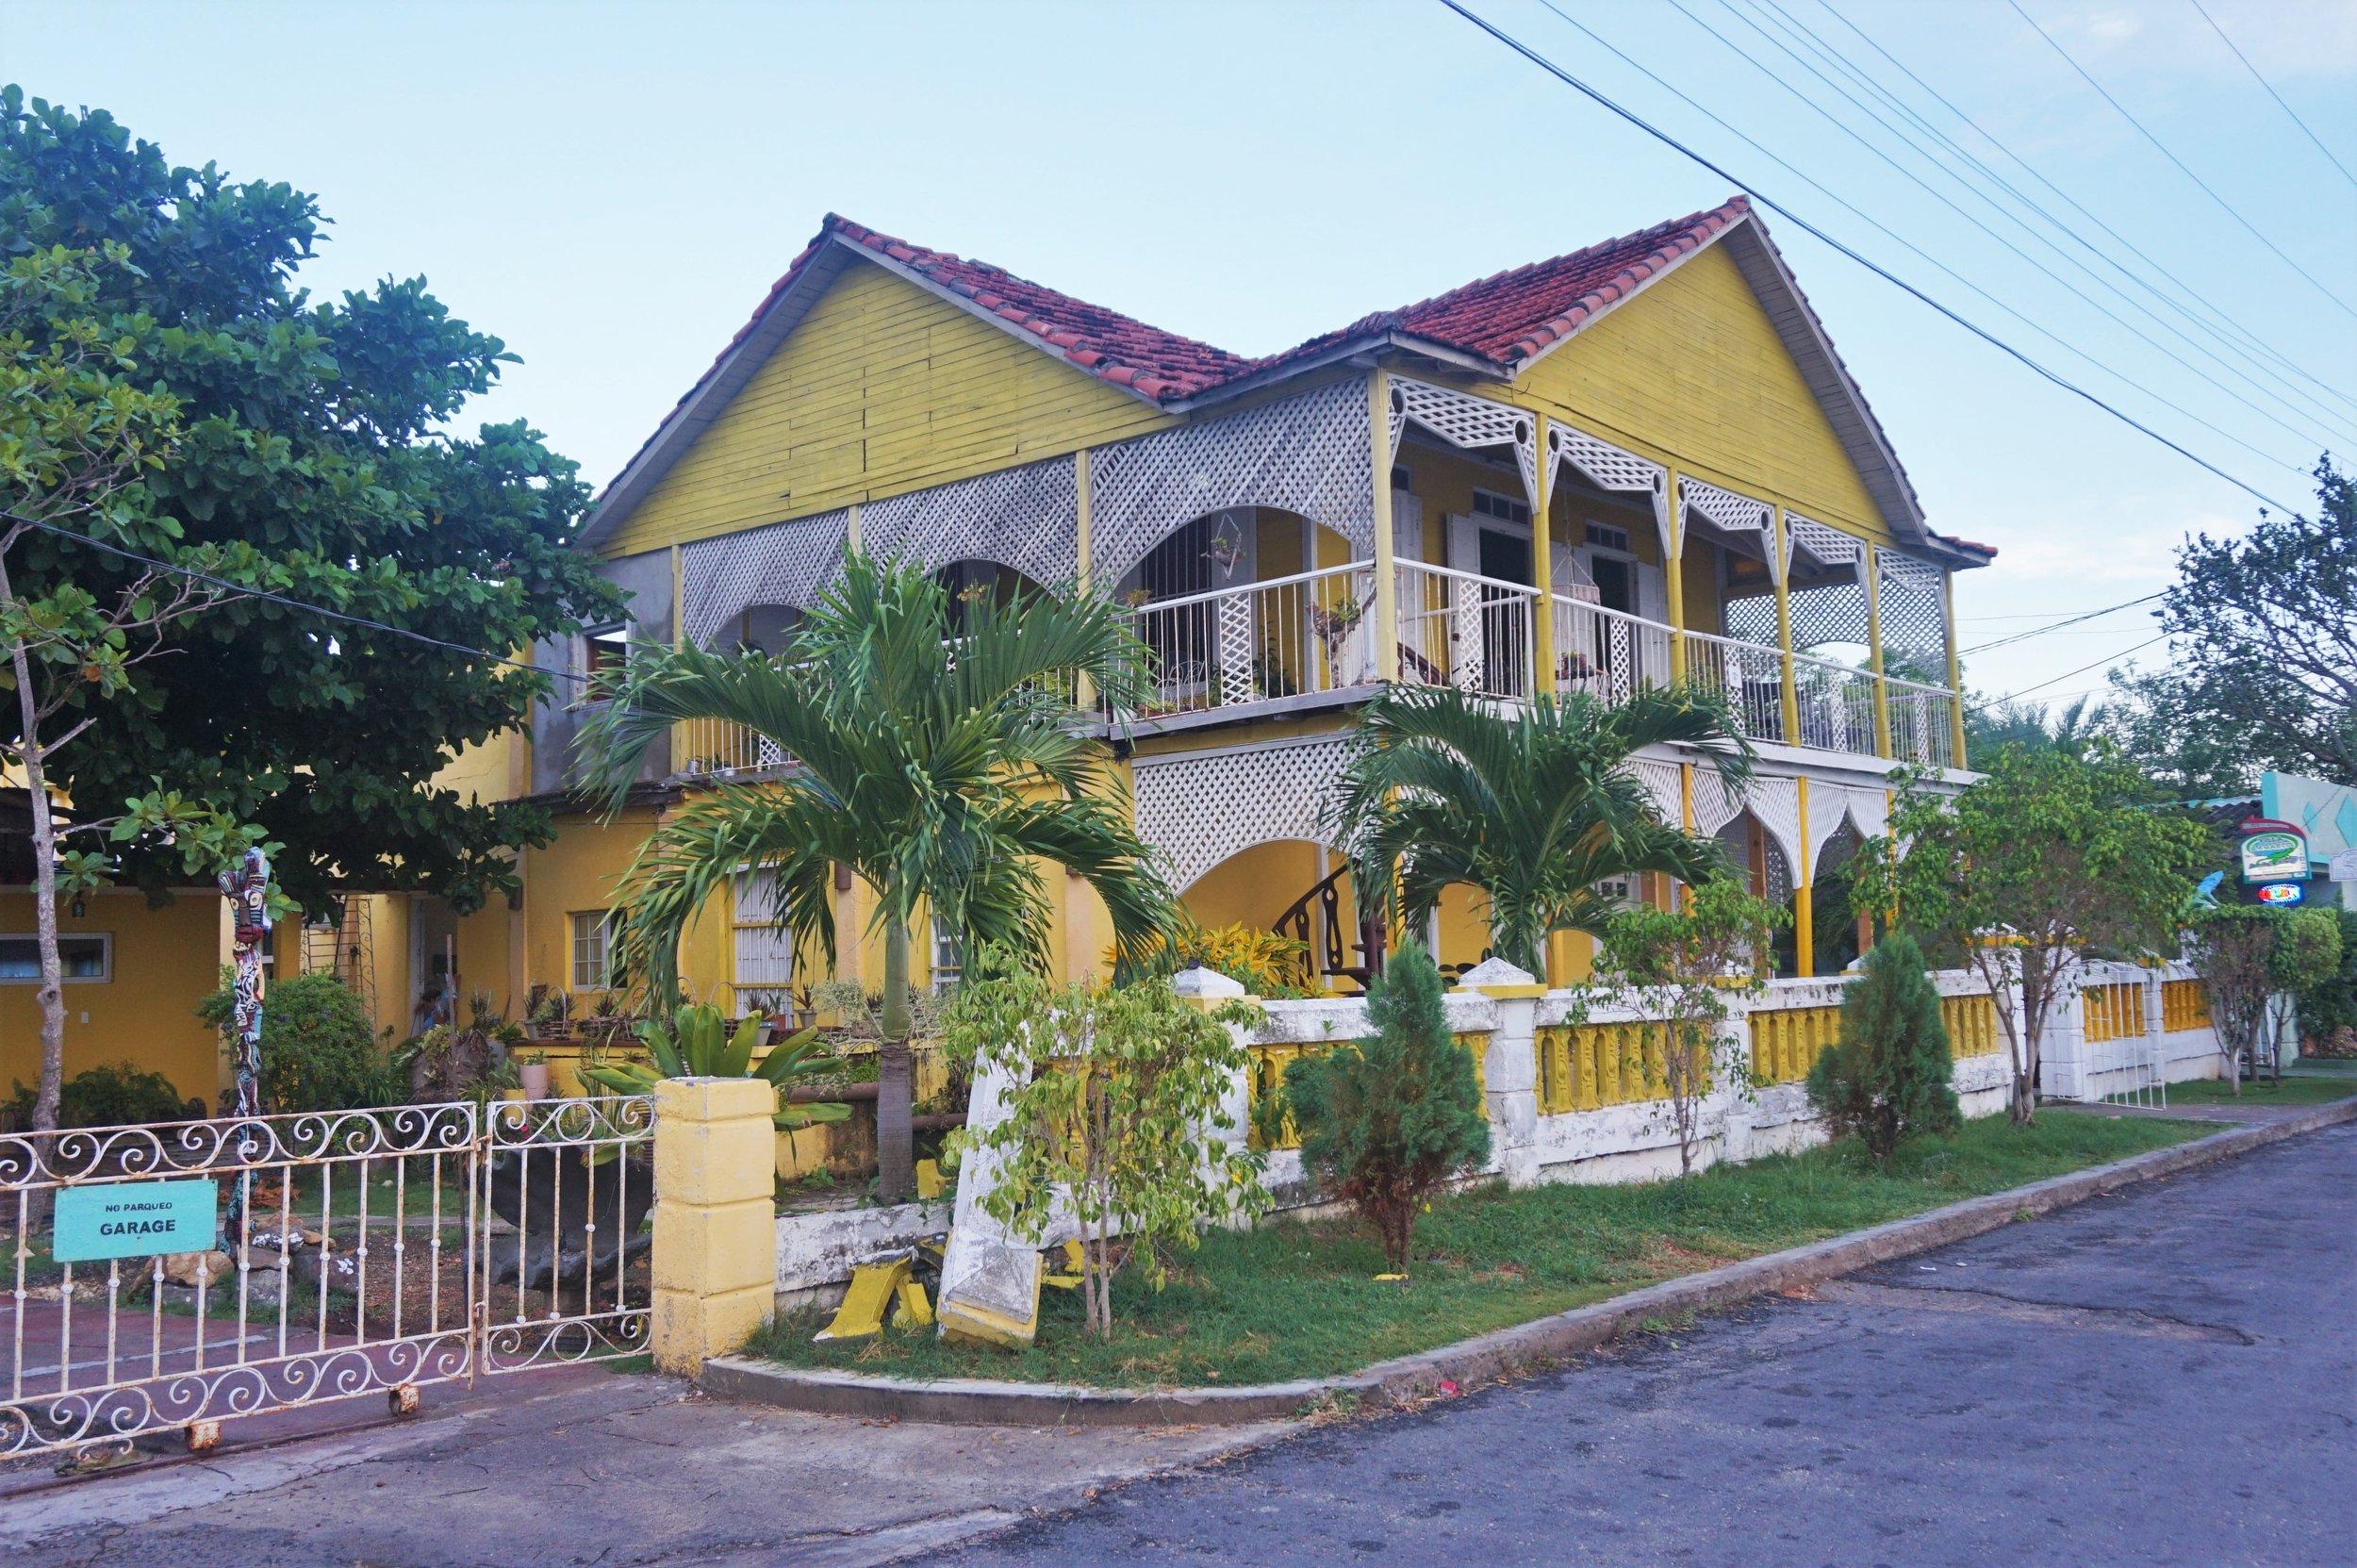 cheap accommodation Cuba-min.JPG